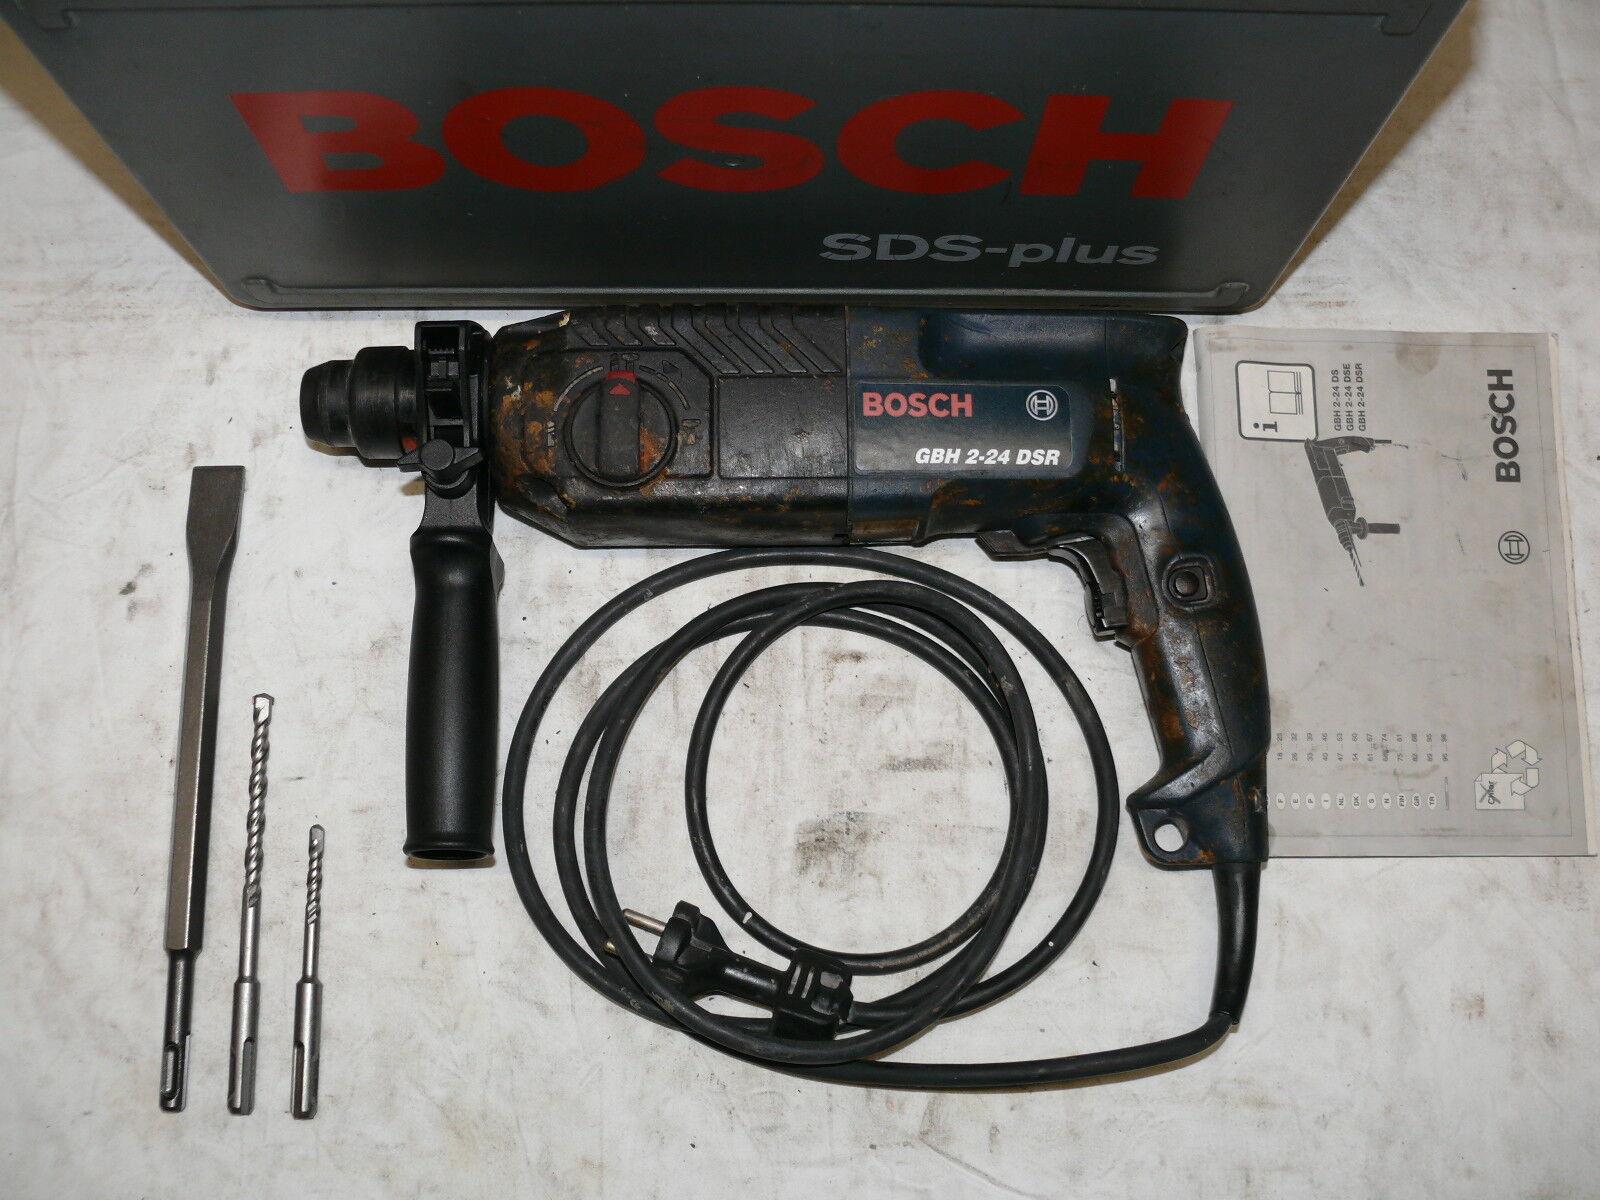 Bosch GBH 2-24 DSR BOHRHAMMER MEIßELHAMMER KOMBIHAMMER STEMMHAMMER ähnl. 2-26